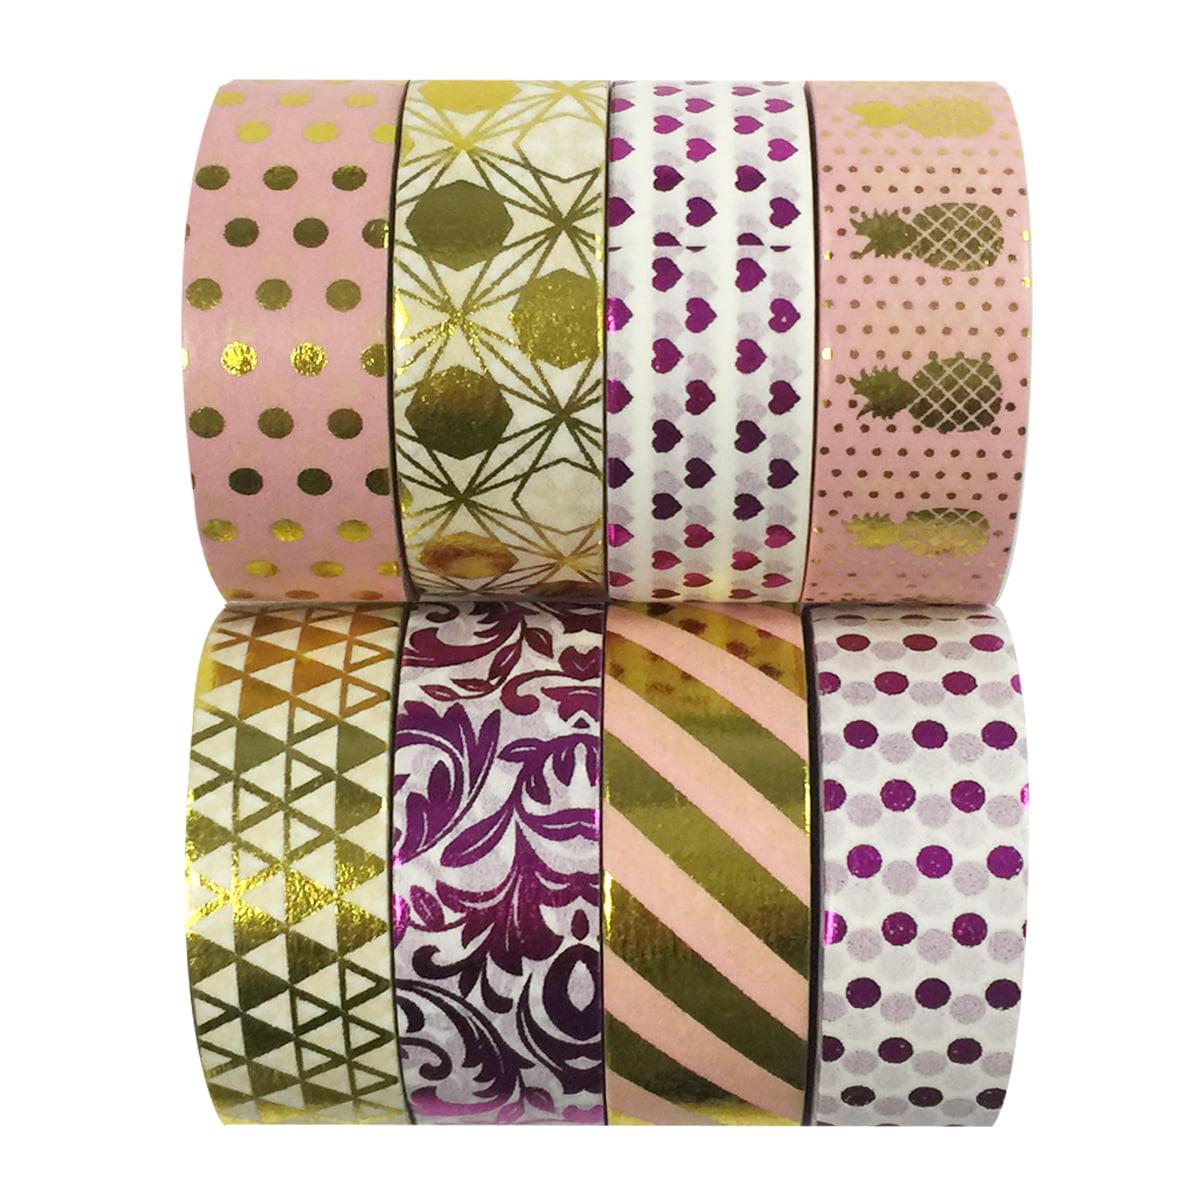 Wrapables® Metallic Foil Washi Masking Tape Collection (Set of 8), 08WPSET05